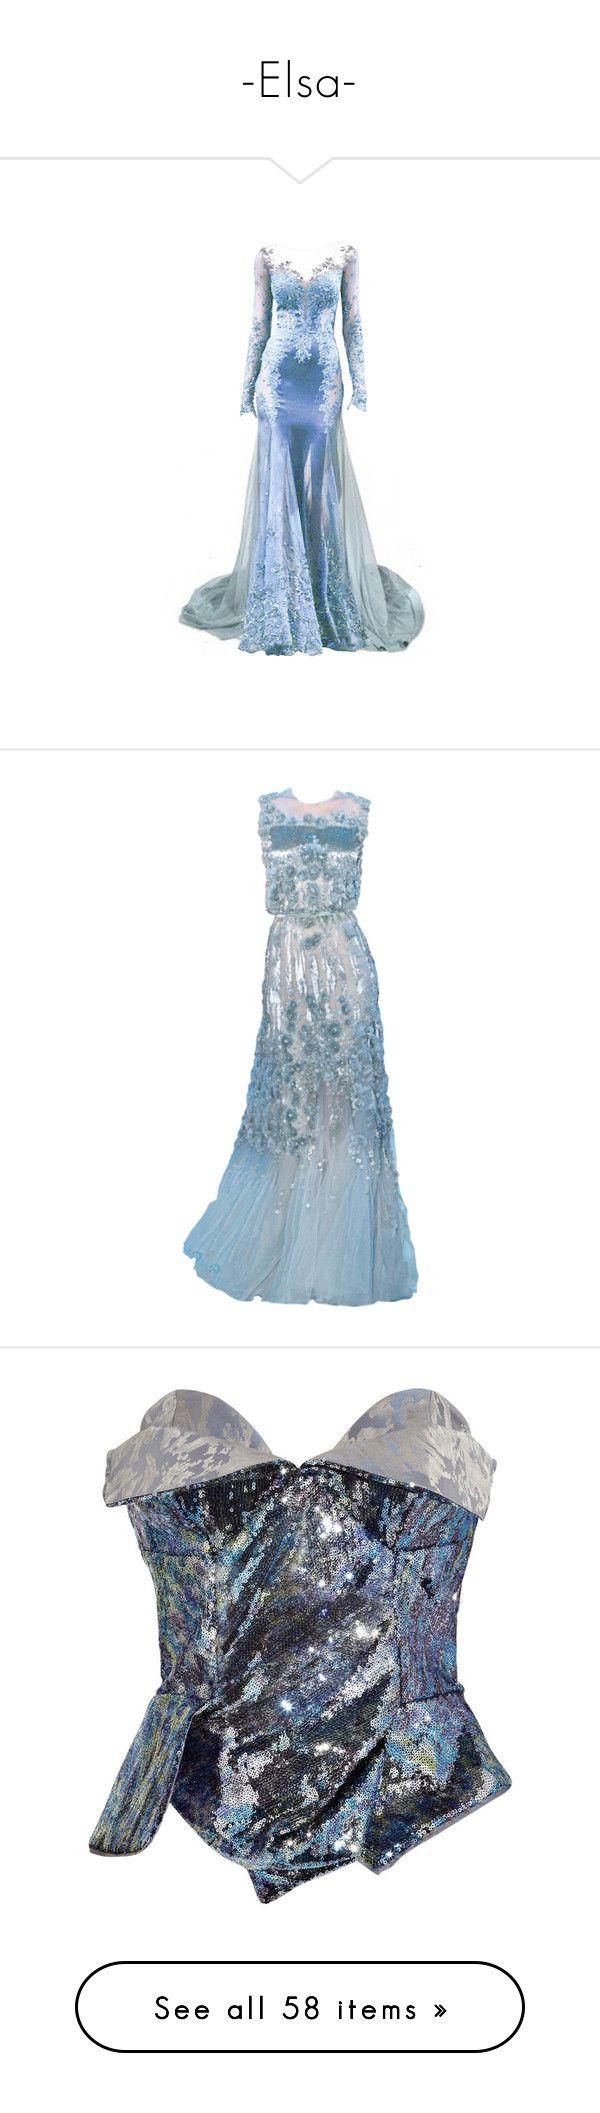 """-Elsa-"" by flowerpetalp ❤ liked on Polyvore featuring dresses, gowns, long dresses, vestidos, elie saab, elie saab dresses, blue dress, long blue evening dress, blue evening gown and blue gown"